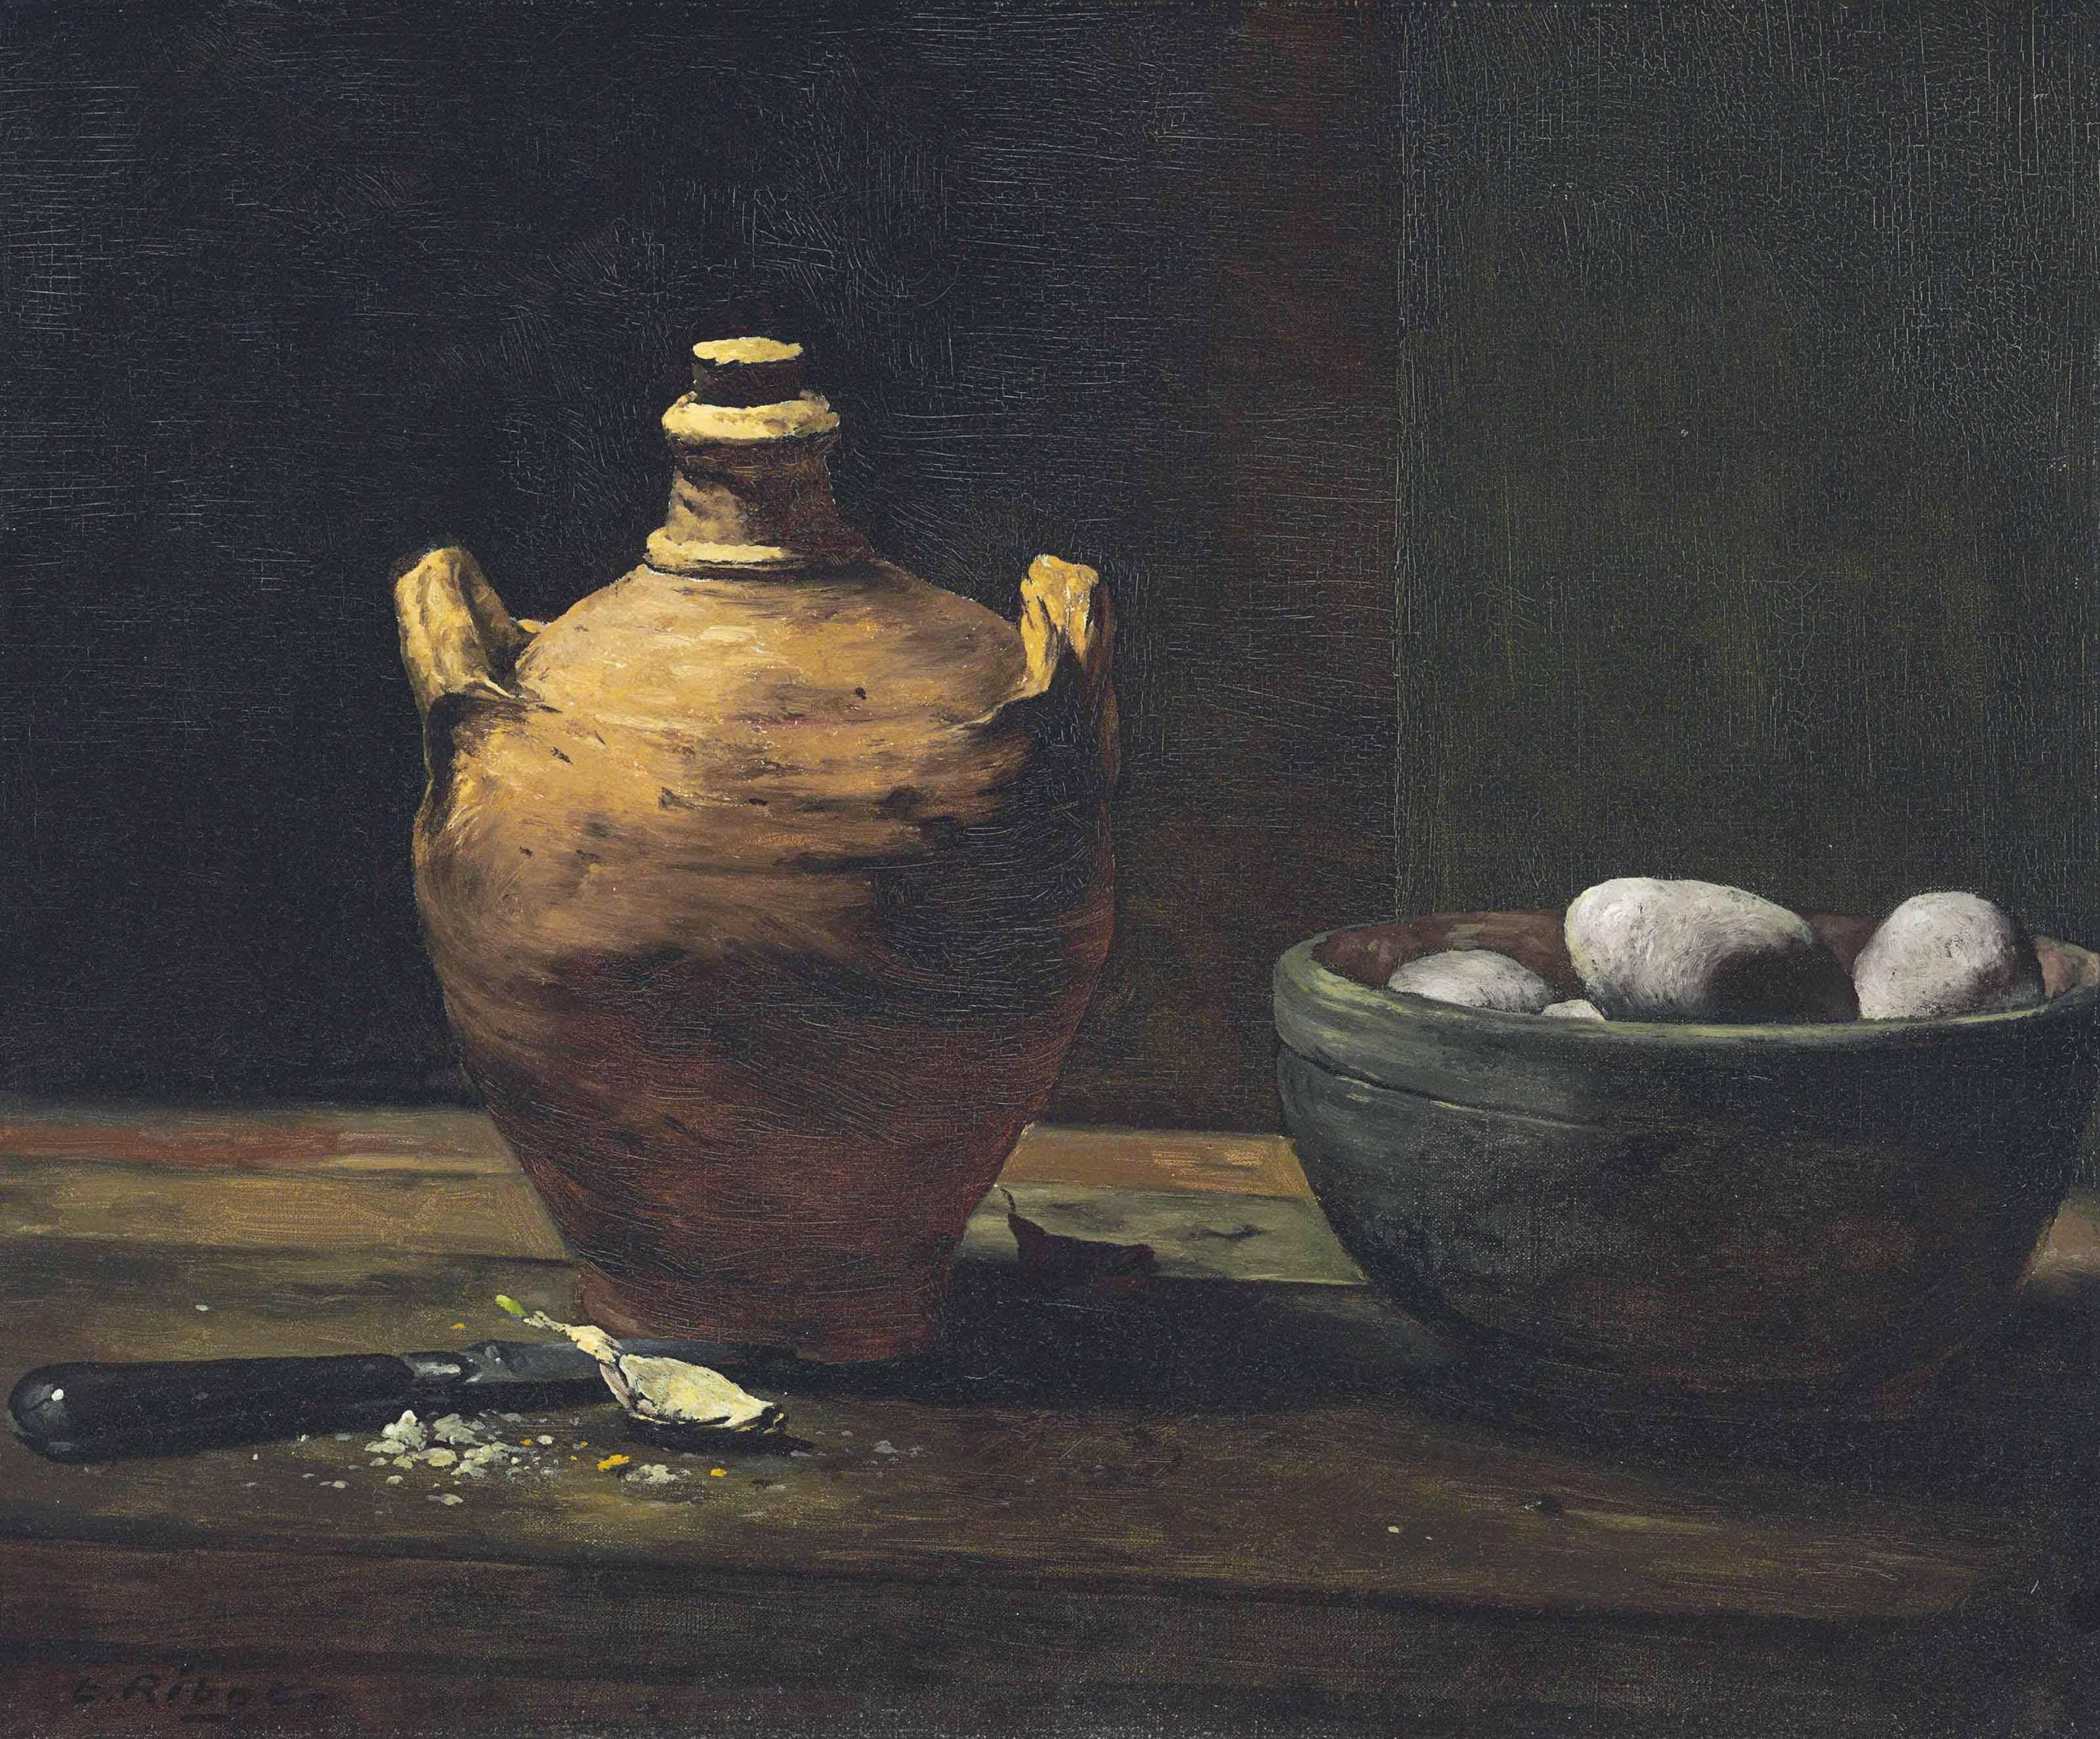 Still Life with Eggs, Garlic, and a Ceramic Jug